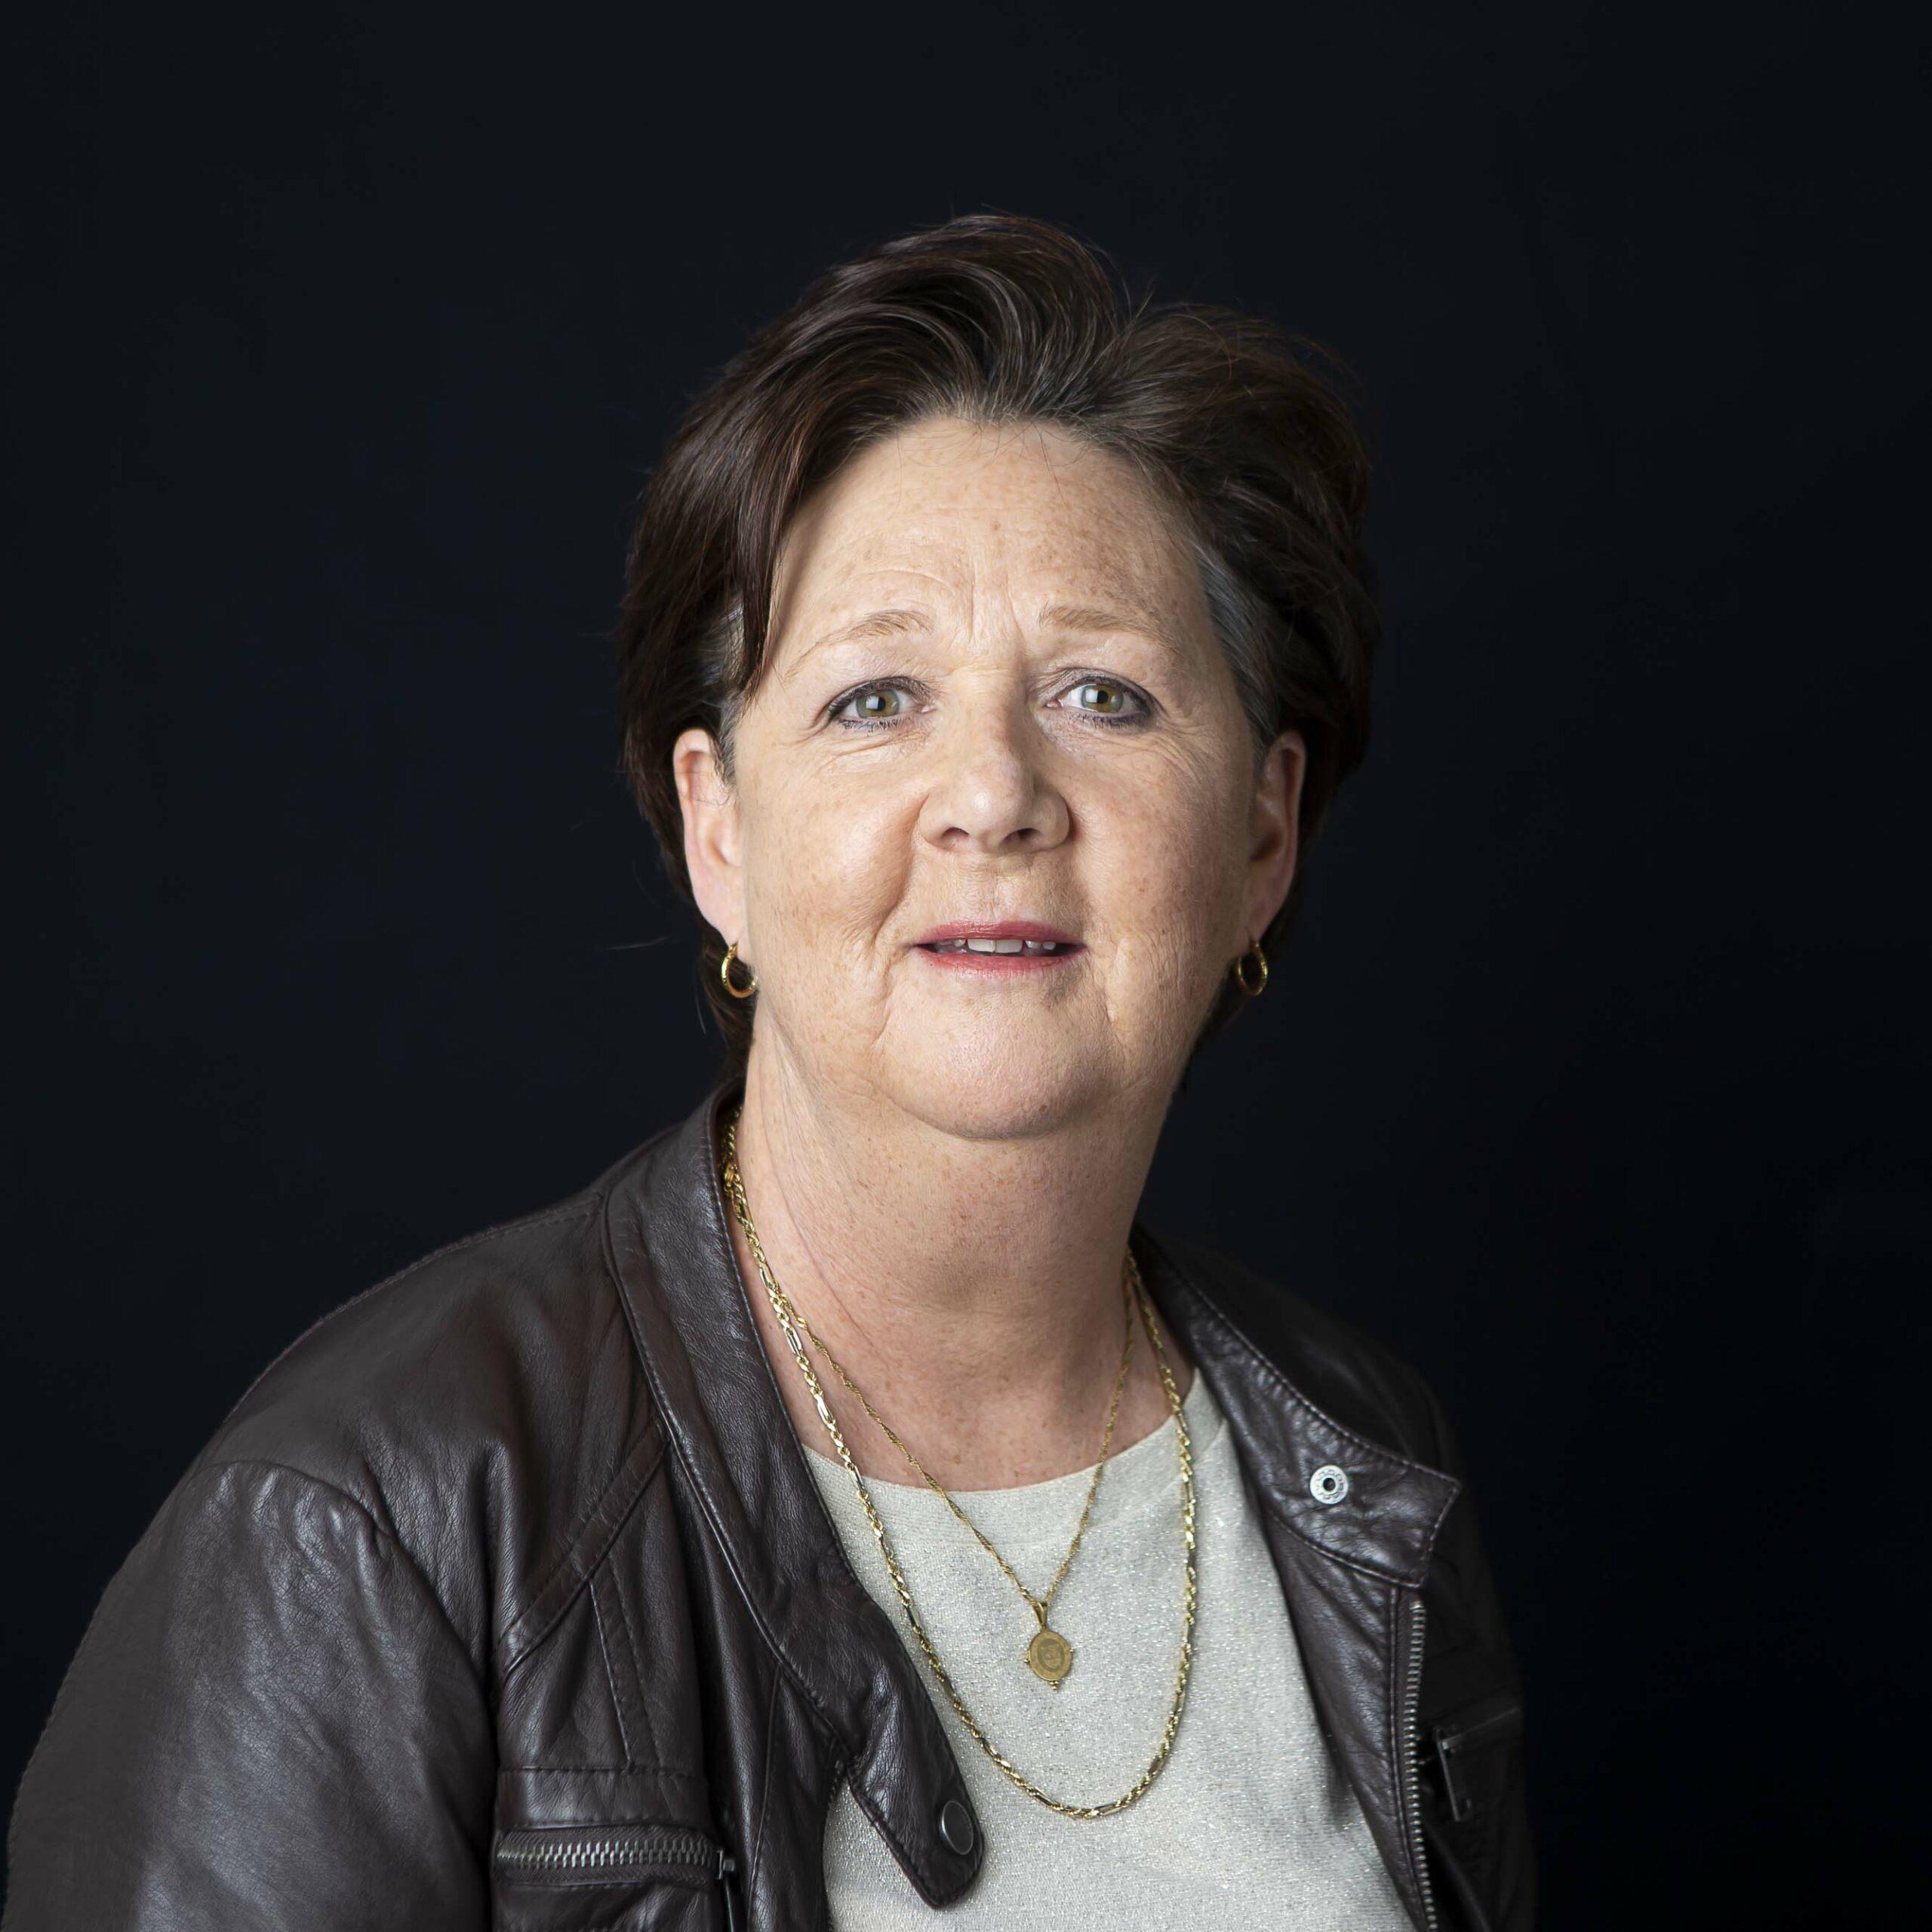 Nadine Soontjens